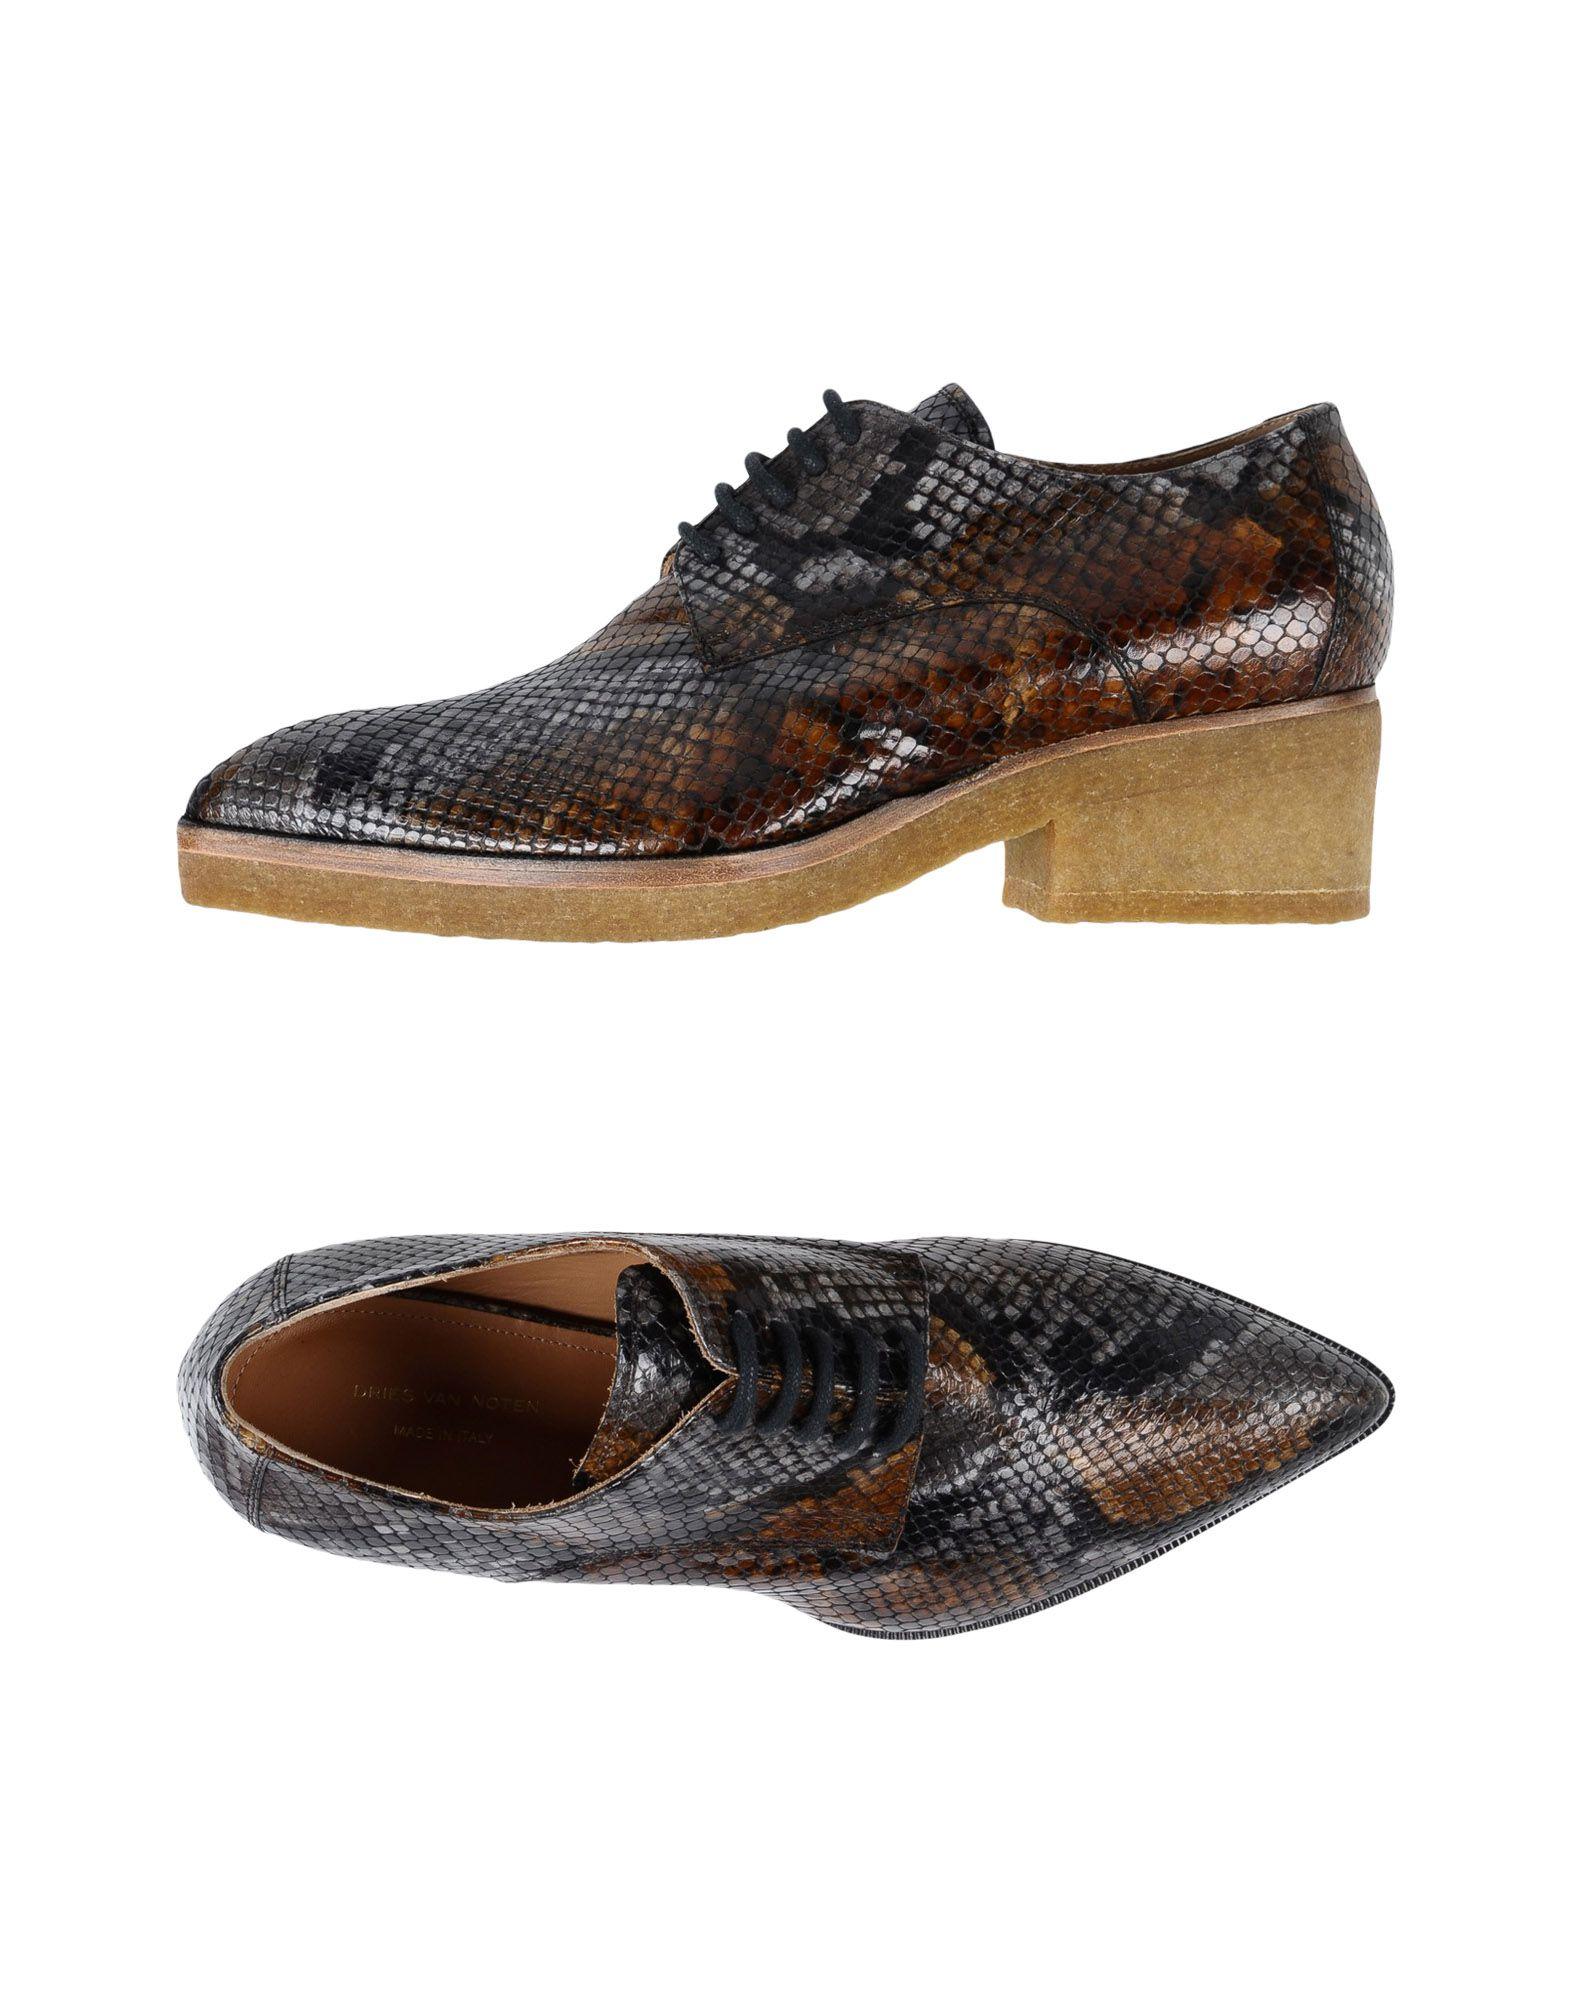 Dries Van Noten Schnürschuhe Damen  11504773OUGünstige gut aussehende Schuhe